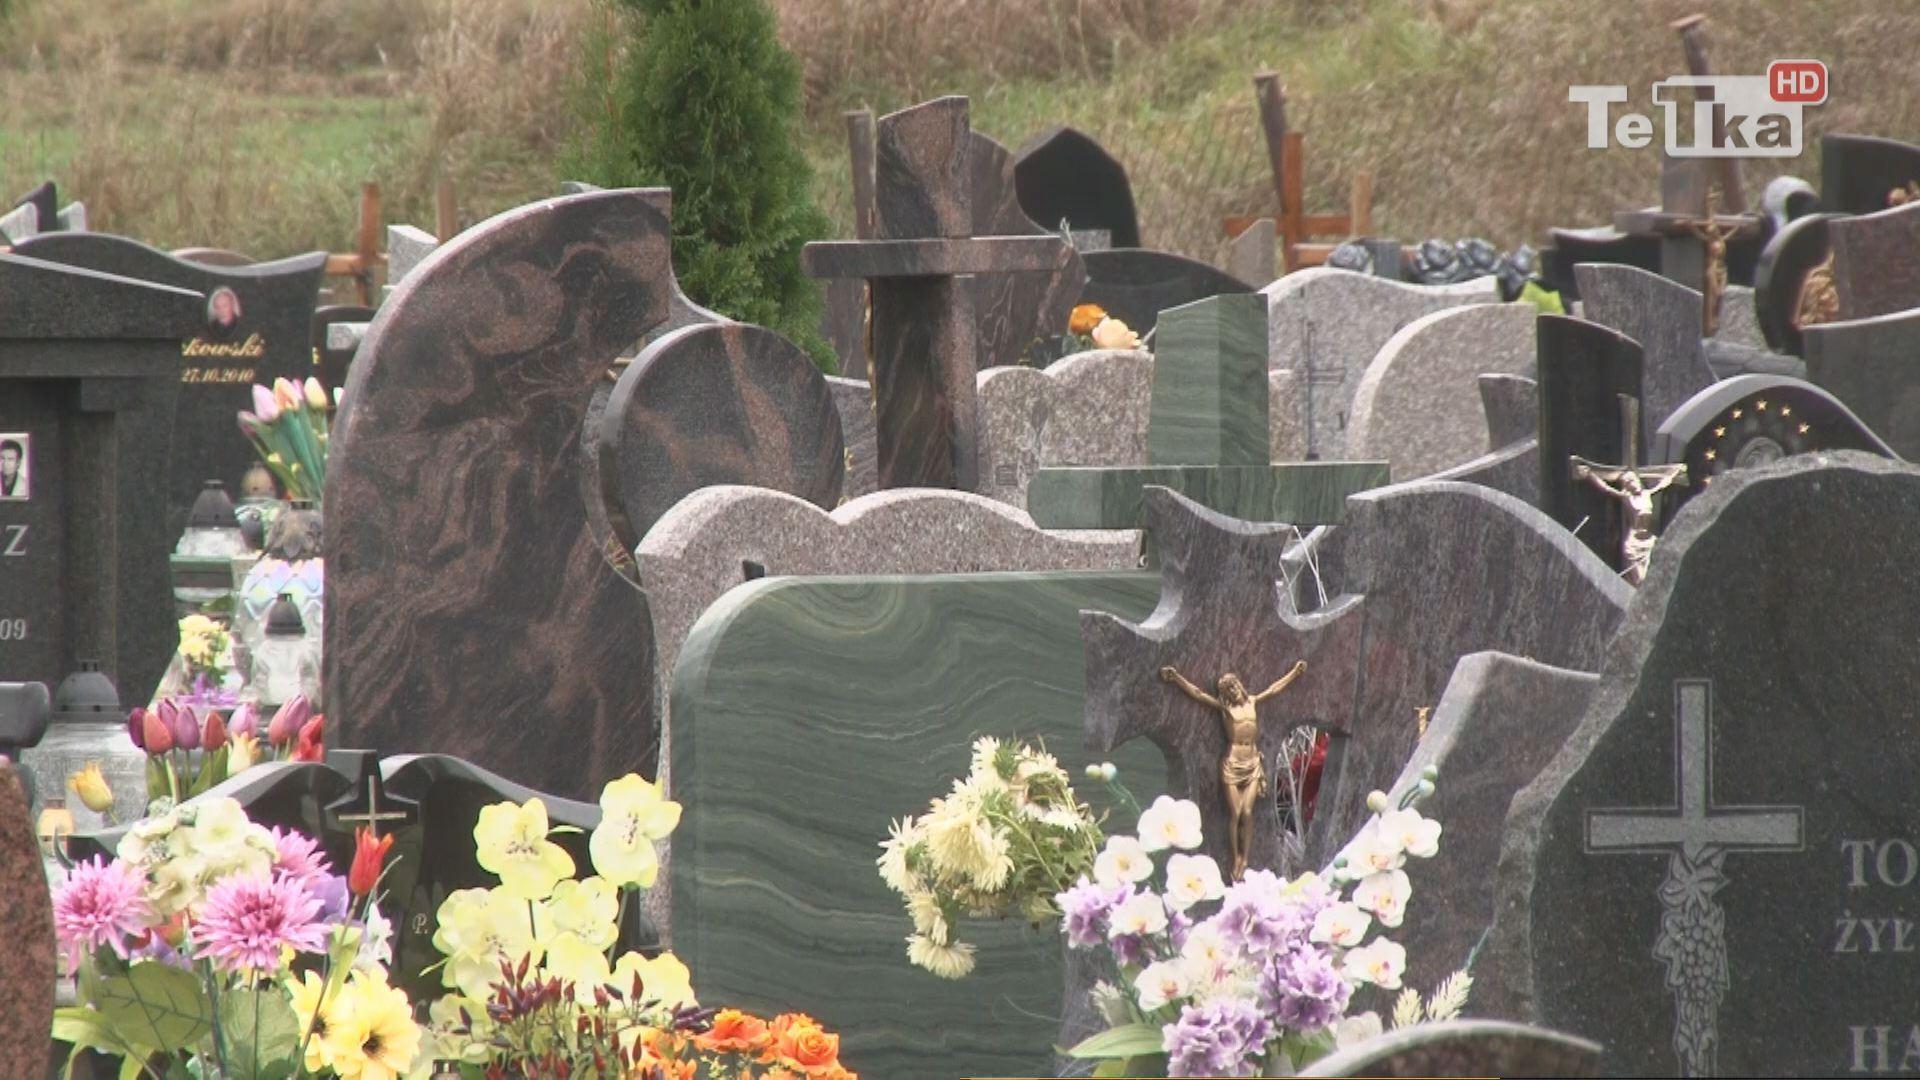 wirtualny cmentarz komunalny